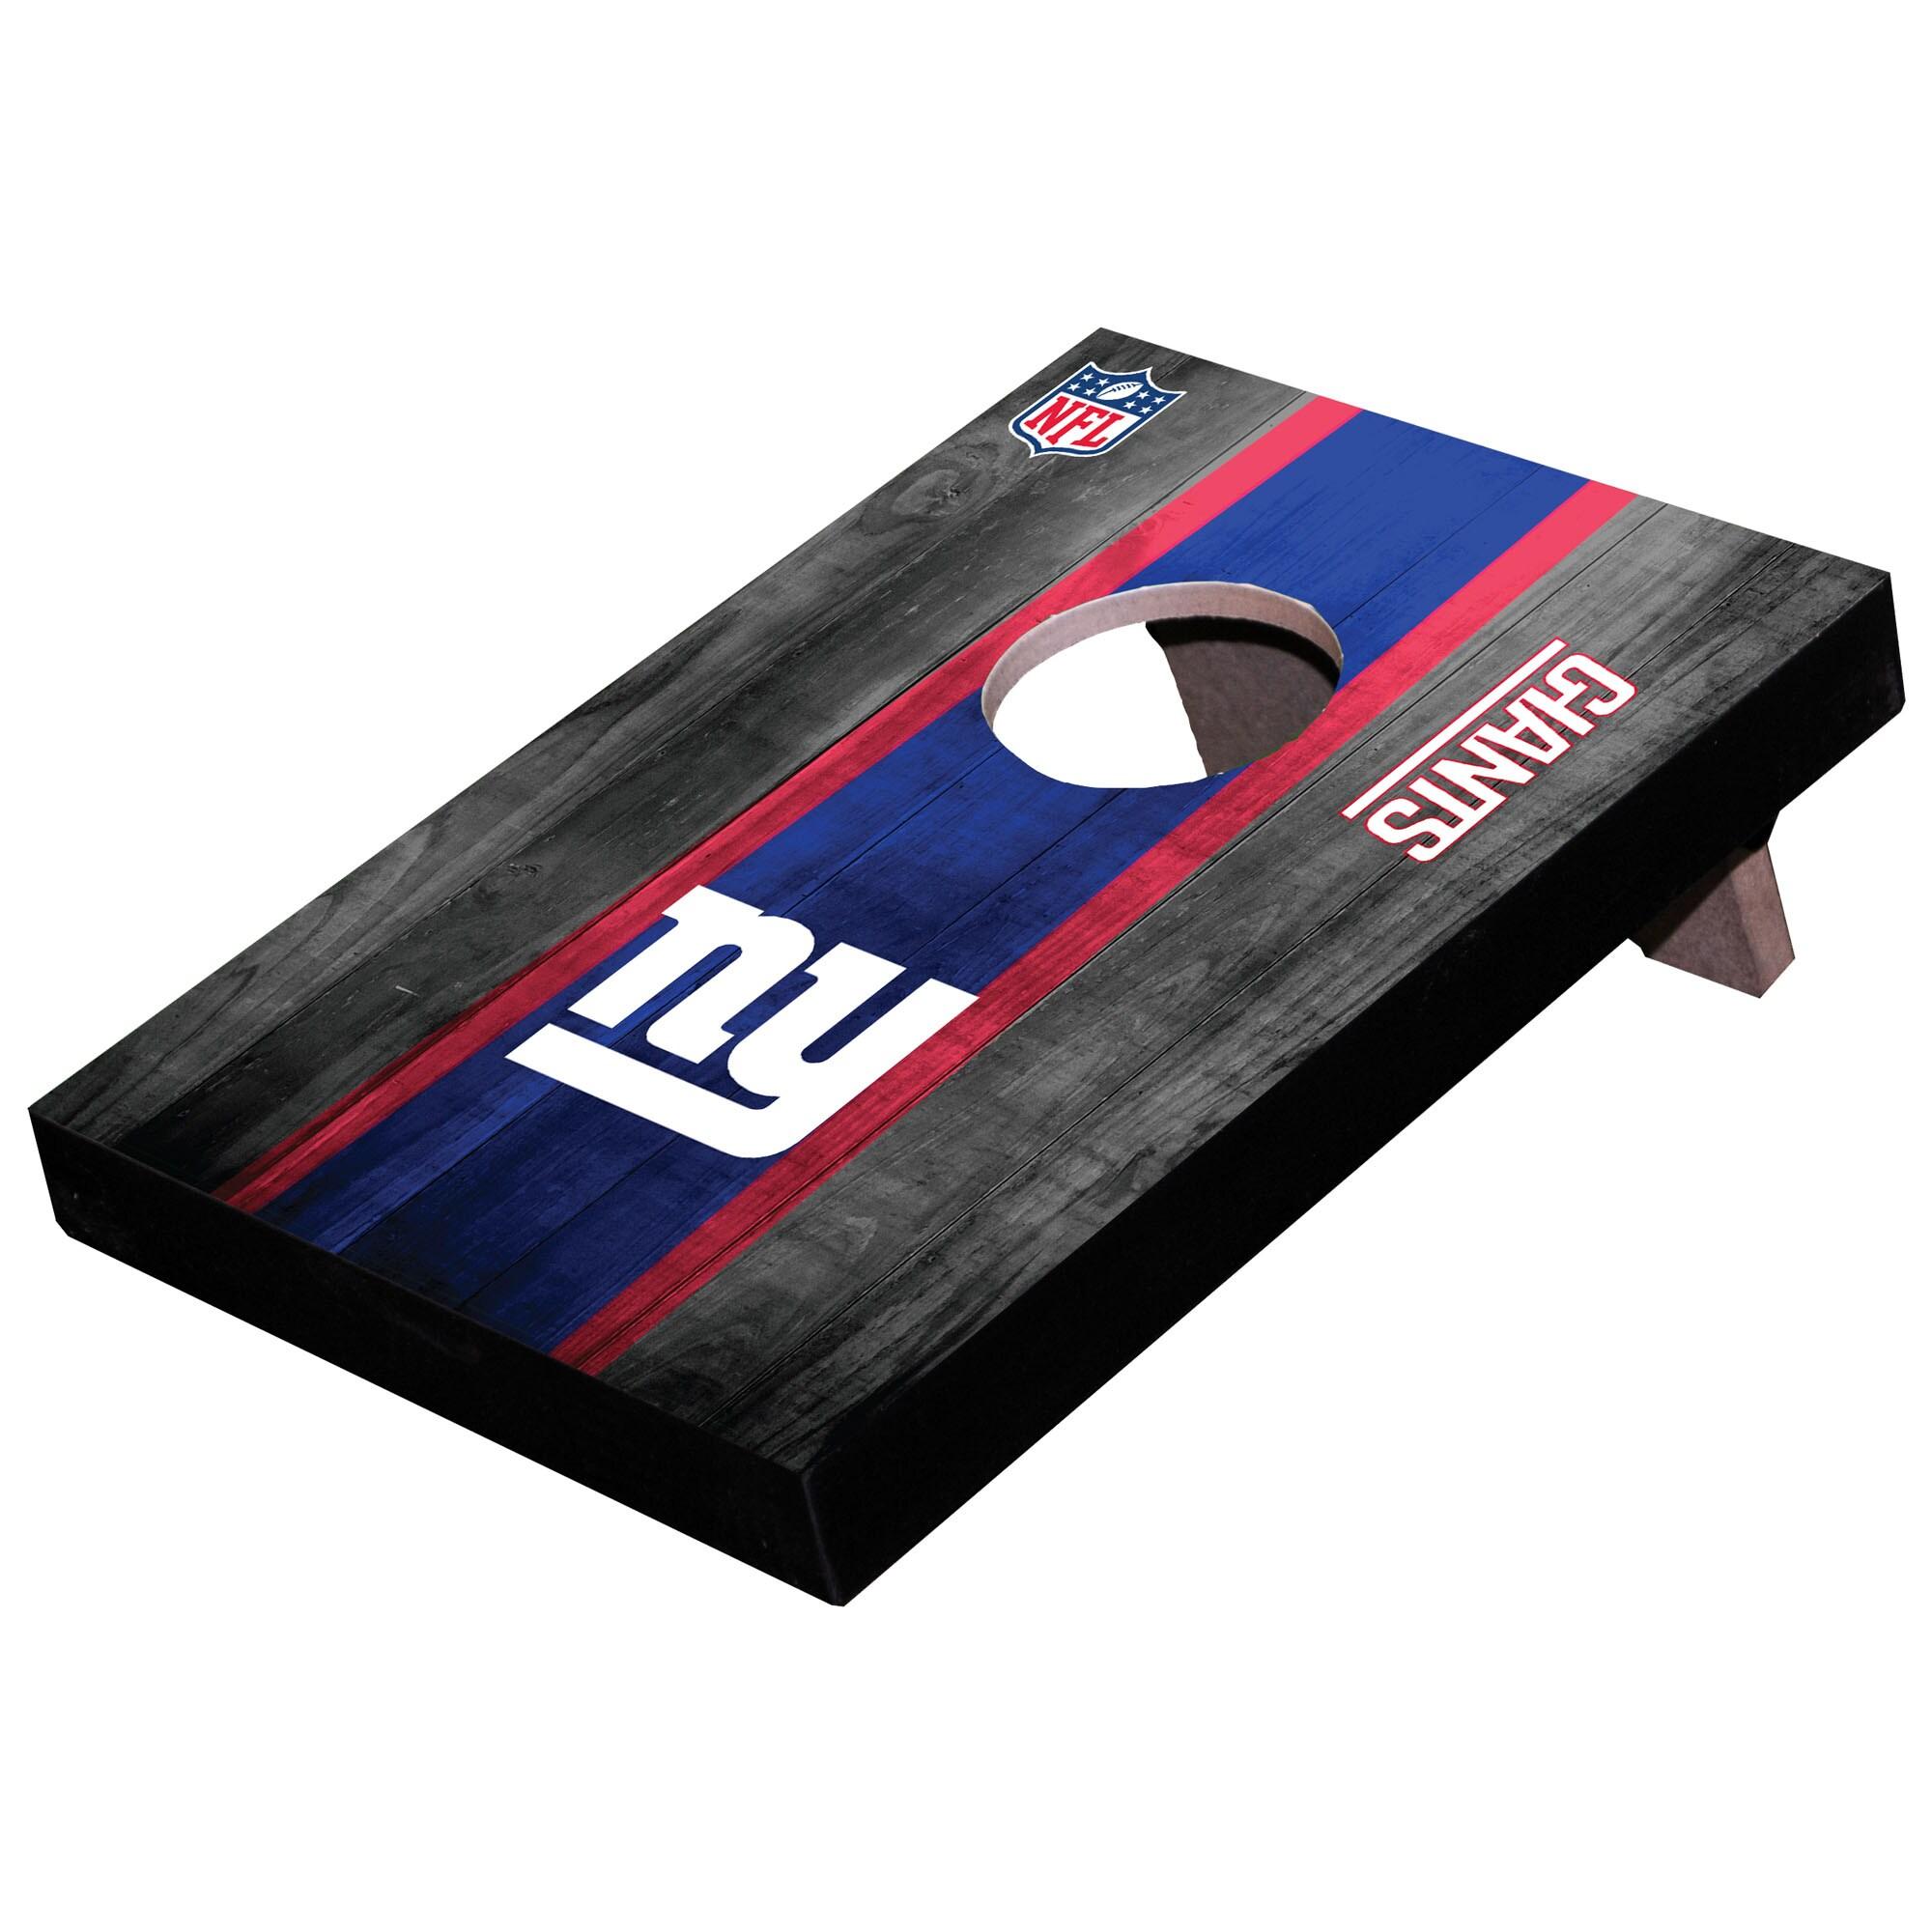 New York Giants Wooden Table Top Toss Set